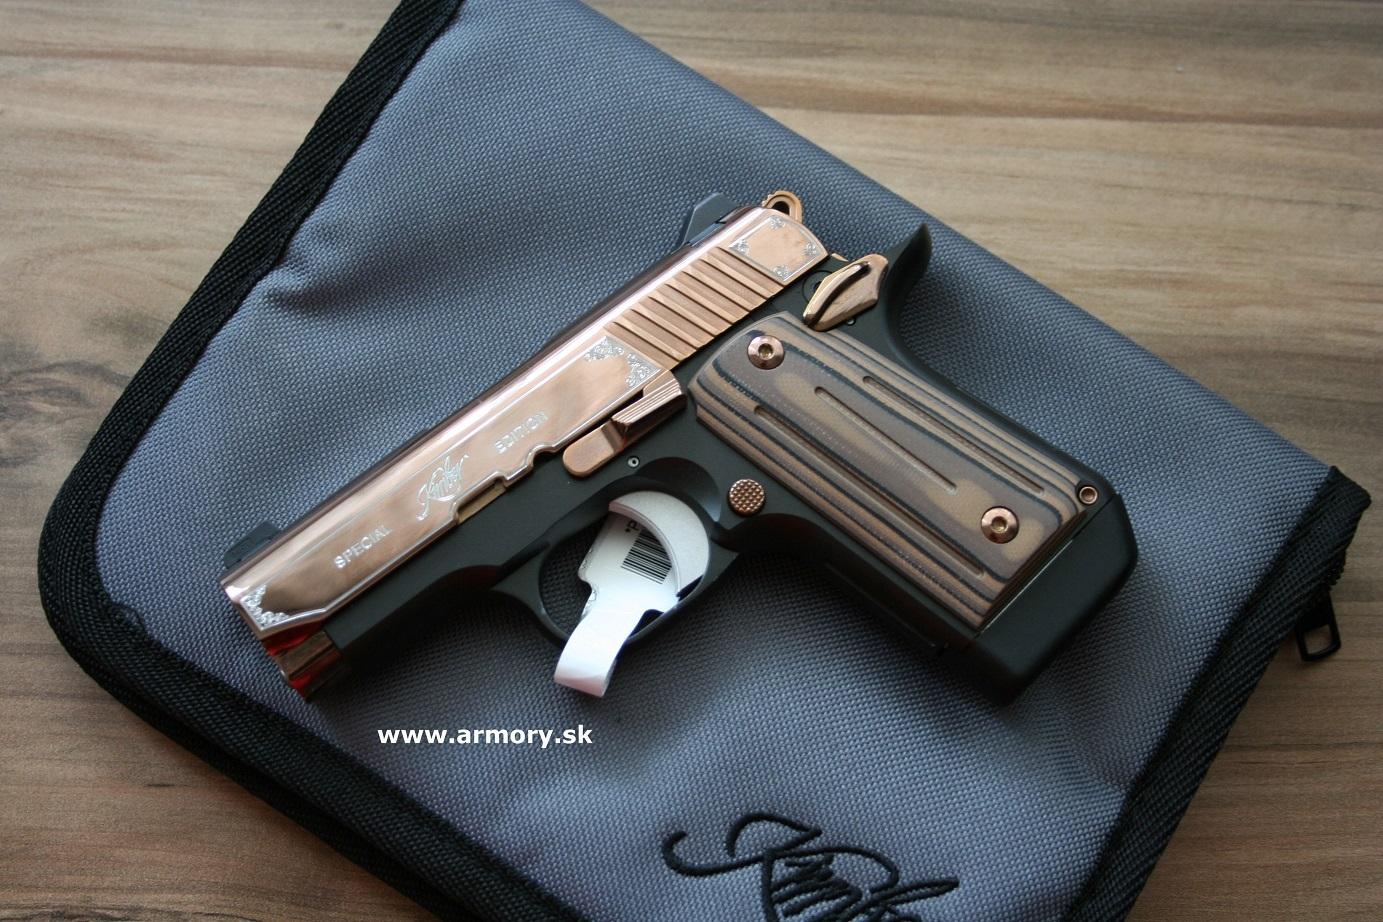 Kimber Micro380 Rose GoldNs Armory Guns Kimber micro Hand guns